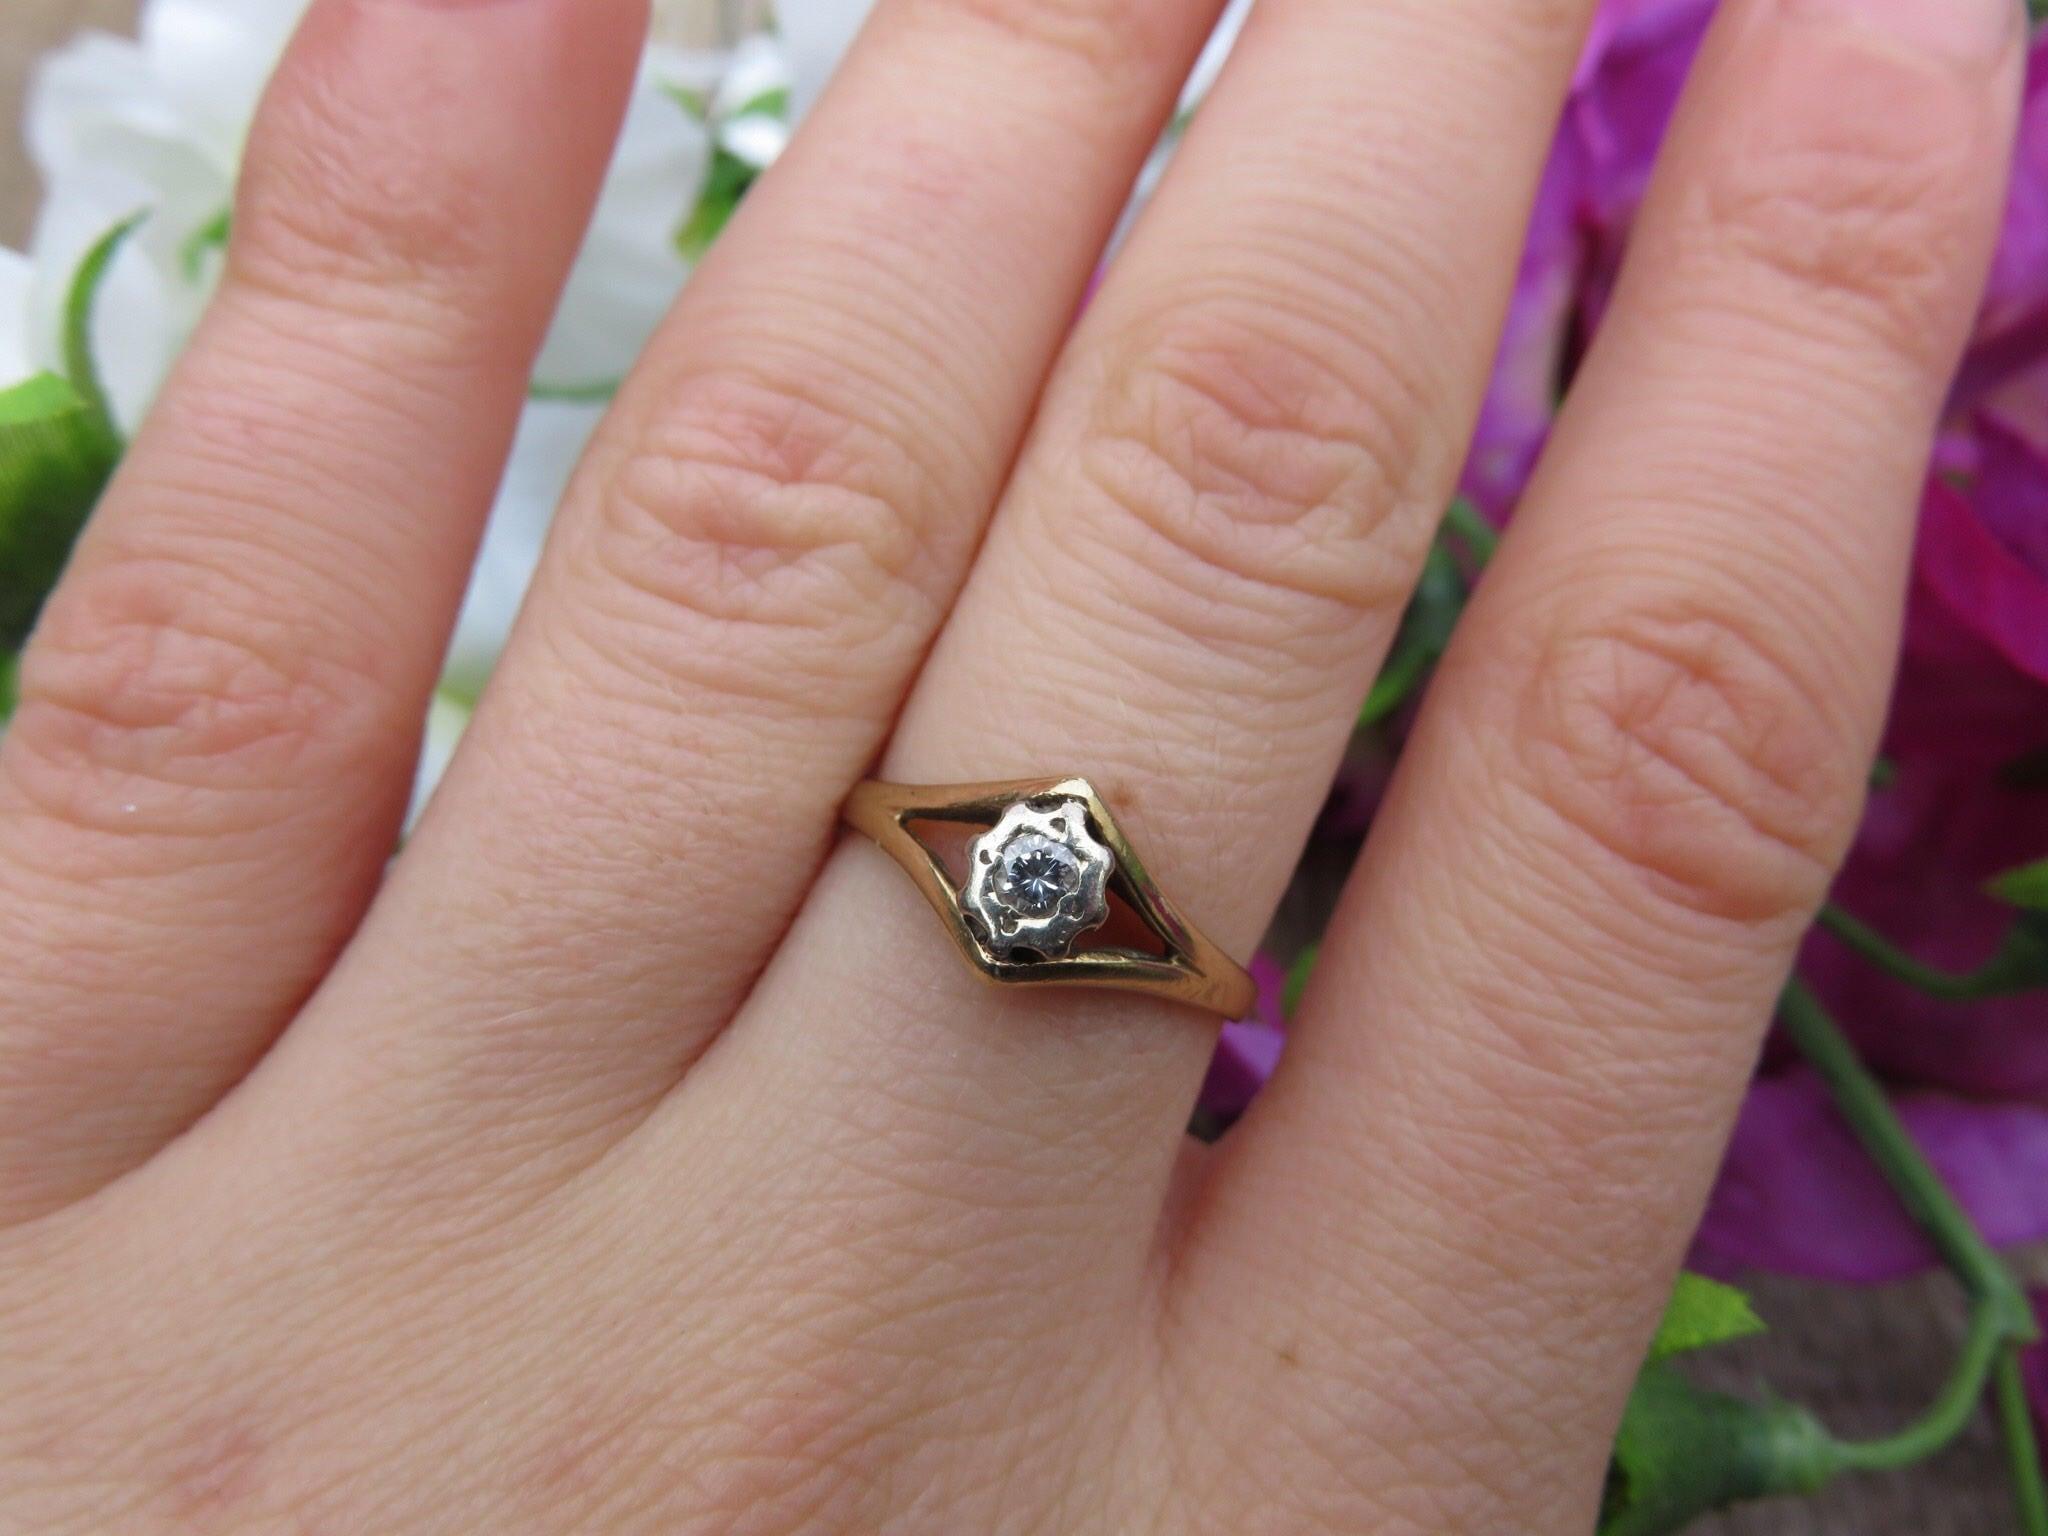 Vintage 9ct Gold Diamond Ring Size K Engagement Ring Art